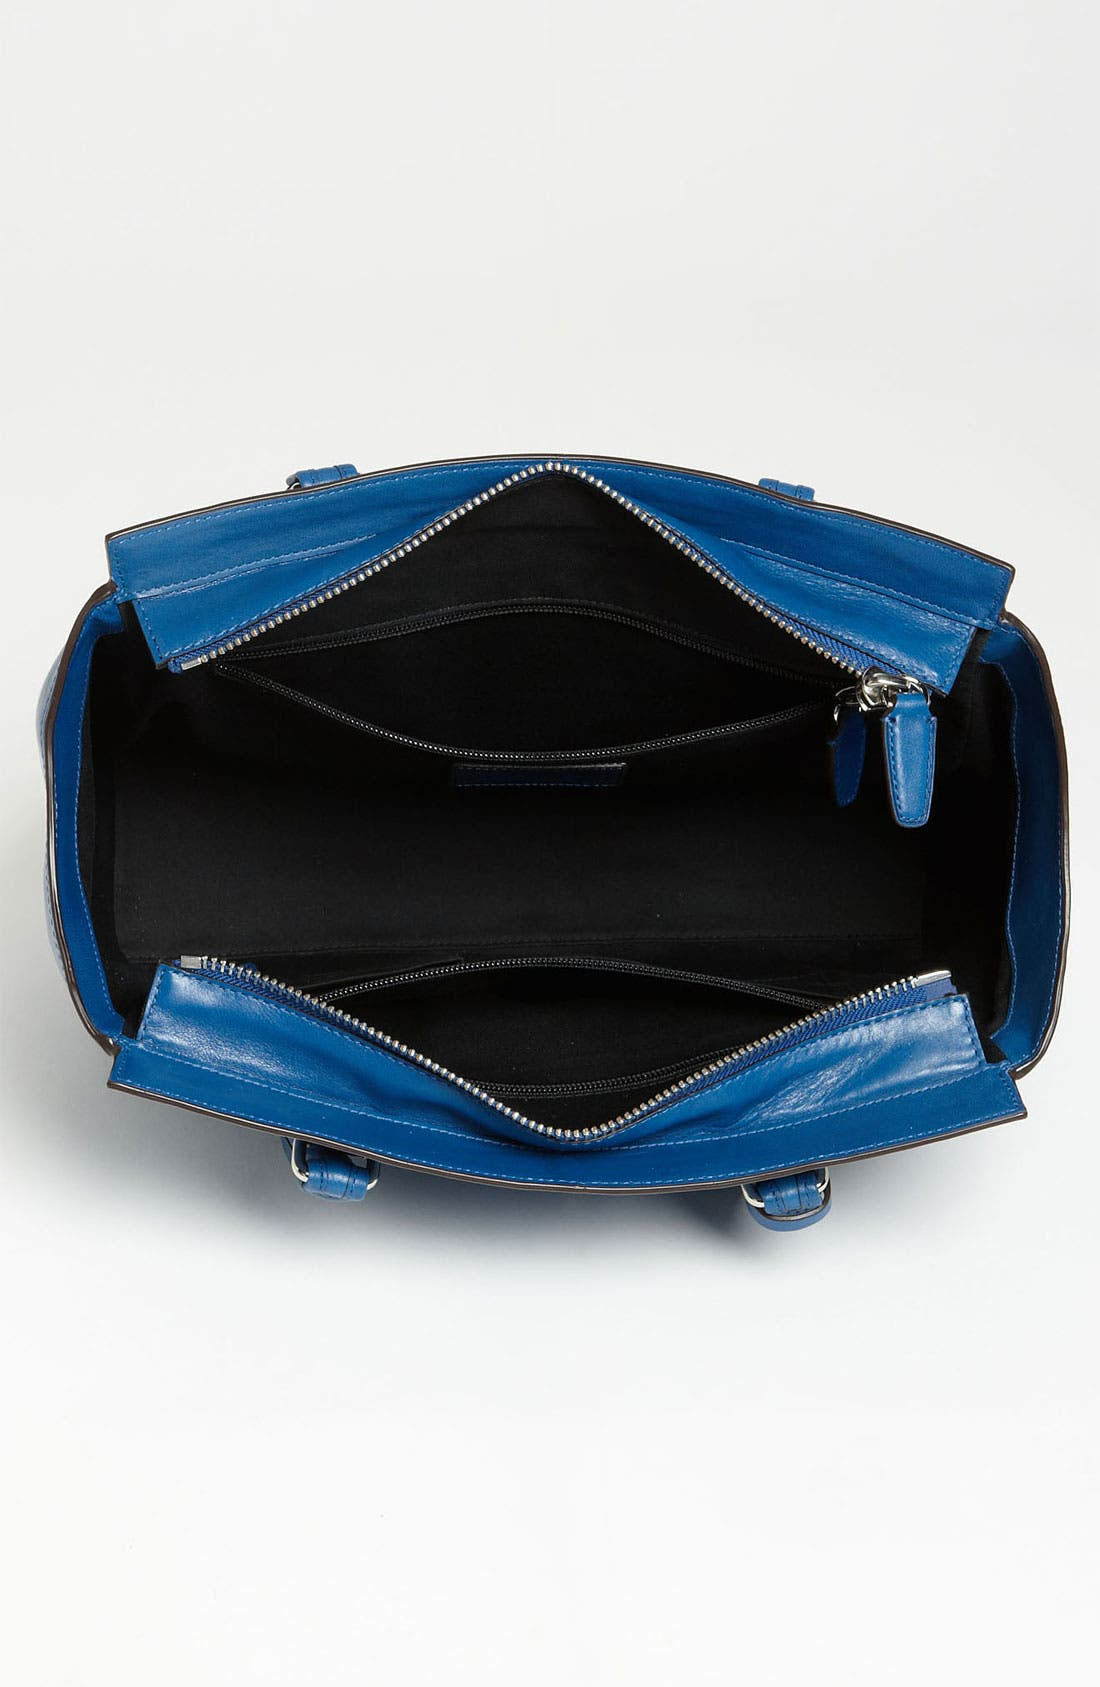 Alternate Image 3  - COACH 'Legacy - Medium' Leather Carryall